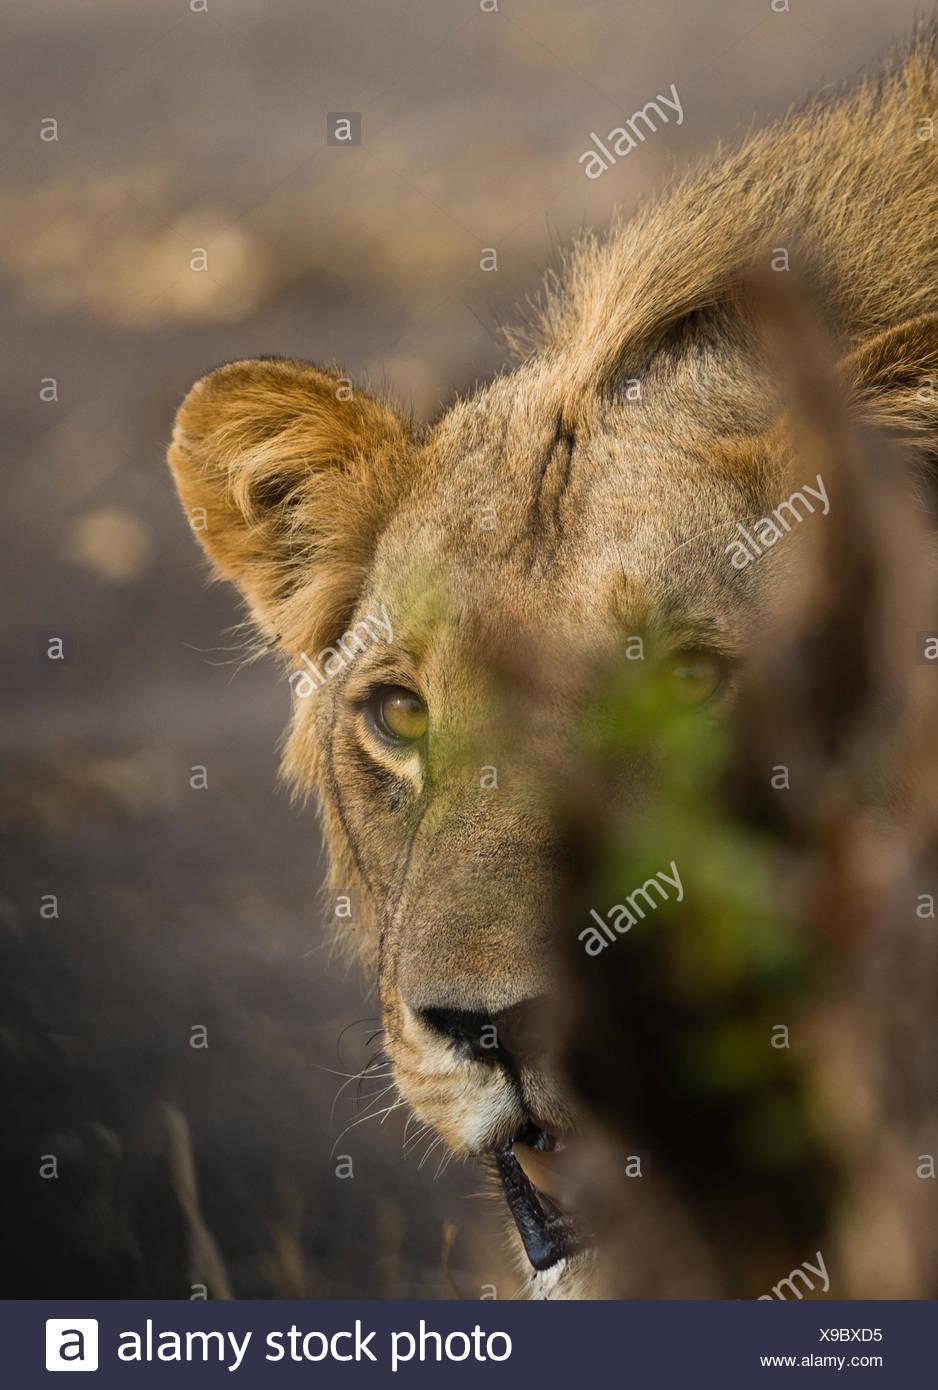 Portrait of a male lion, Panthera leo. - Stock Image